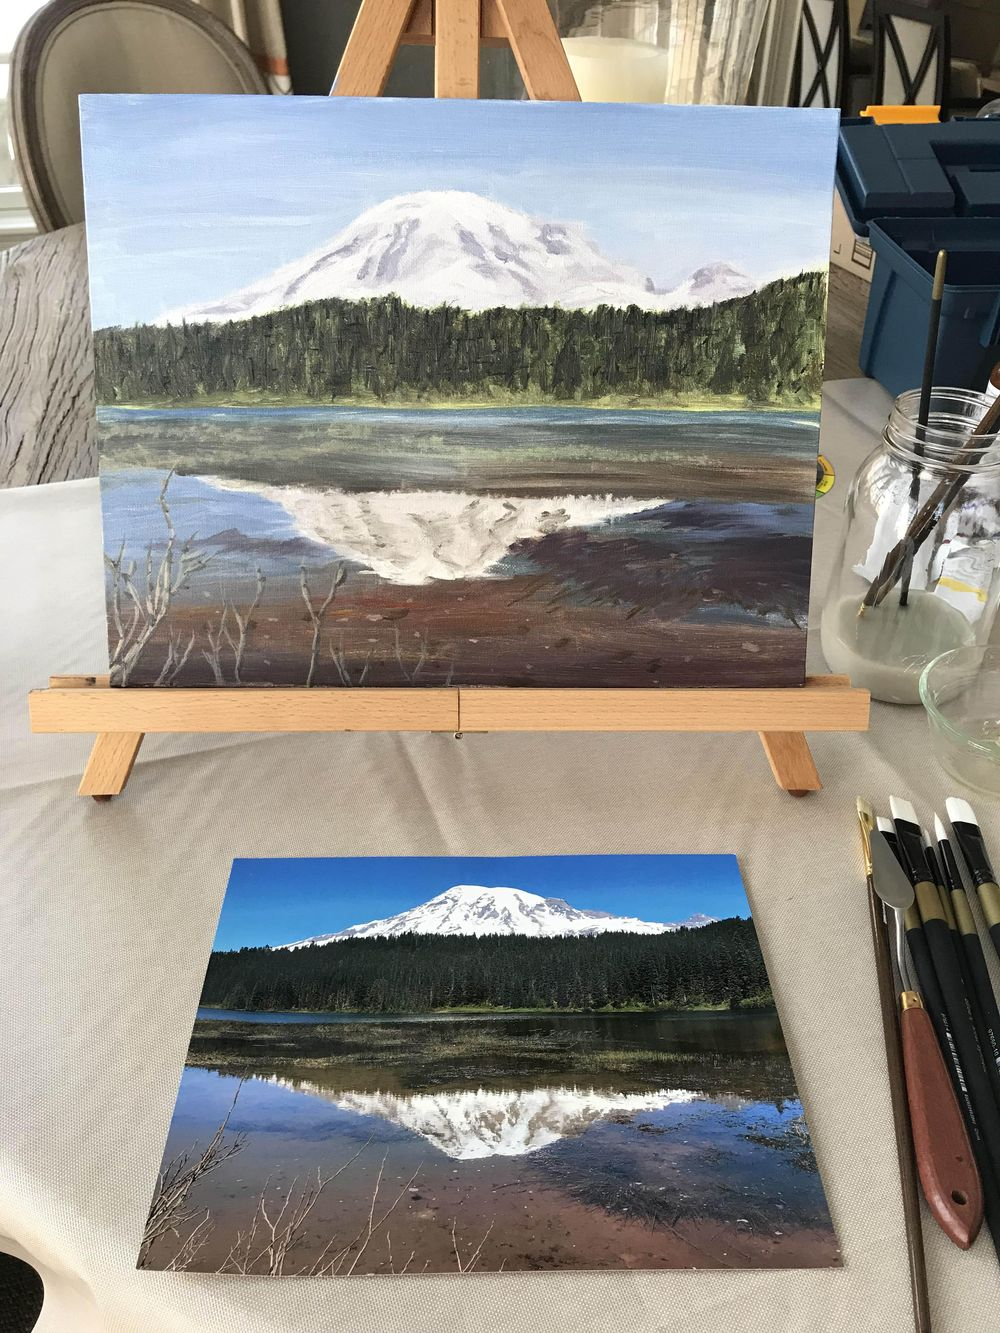 Mt. Rainier - image 1 - student project